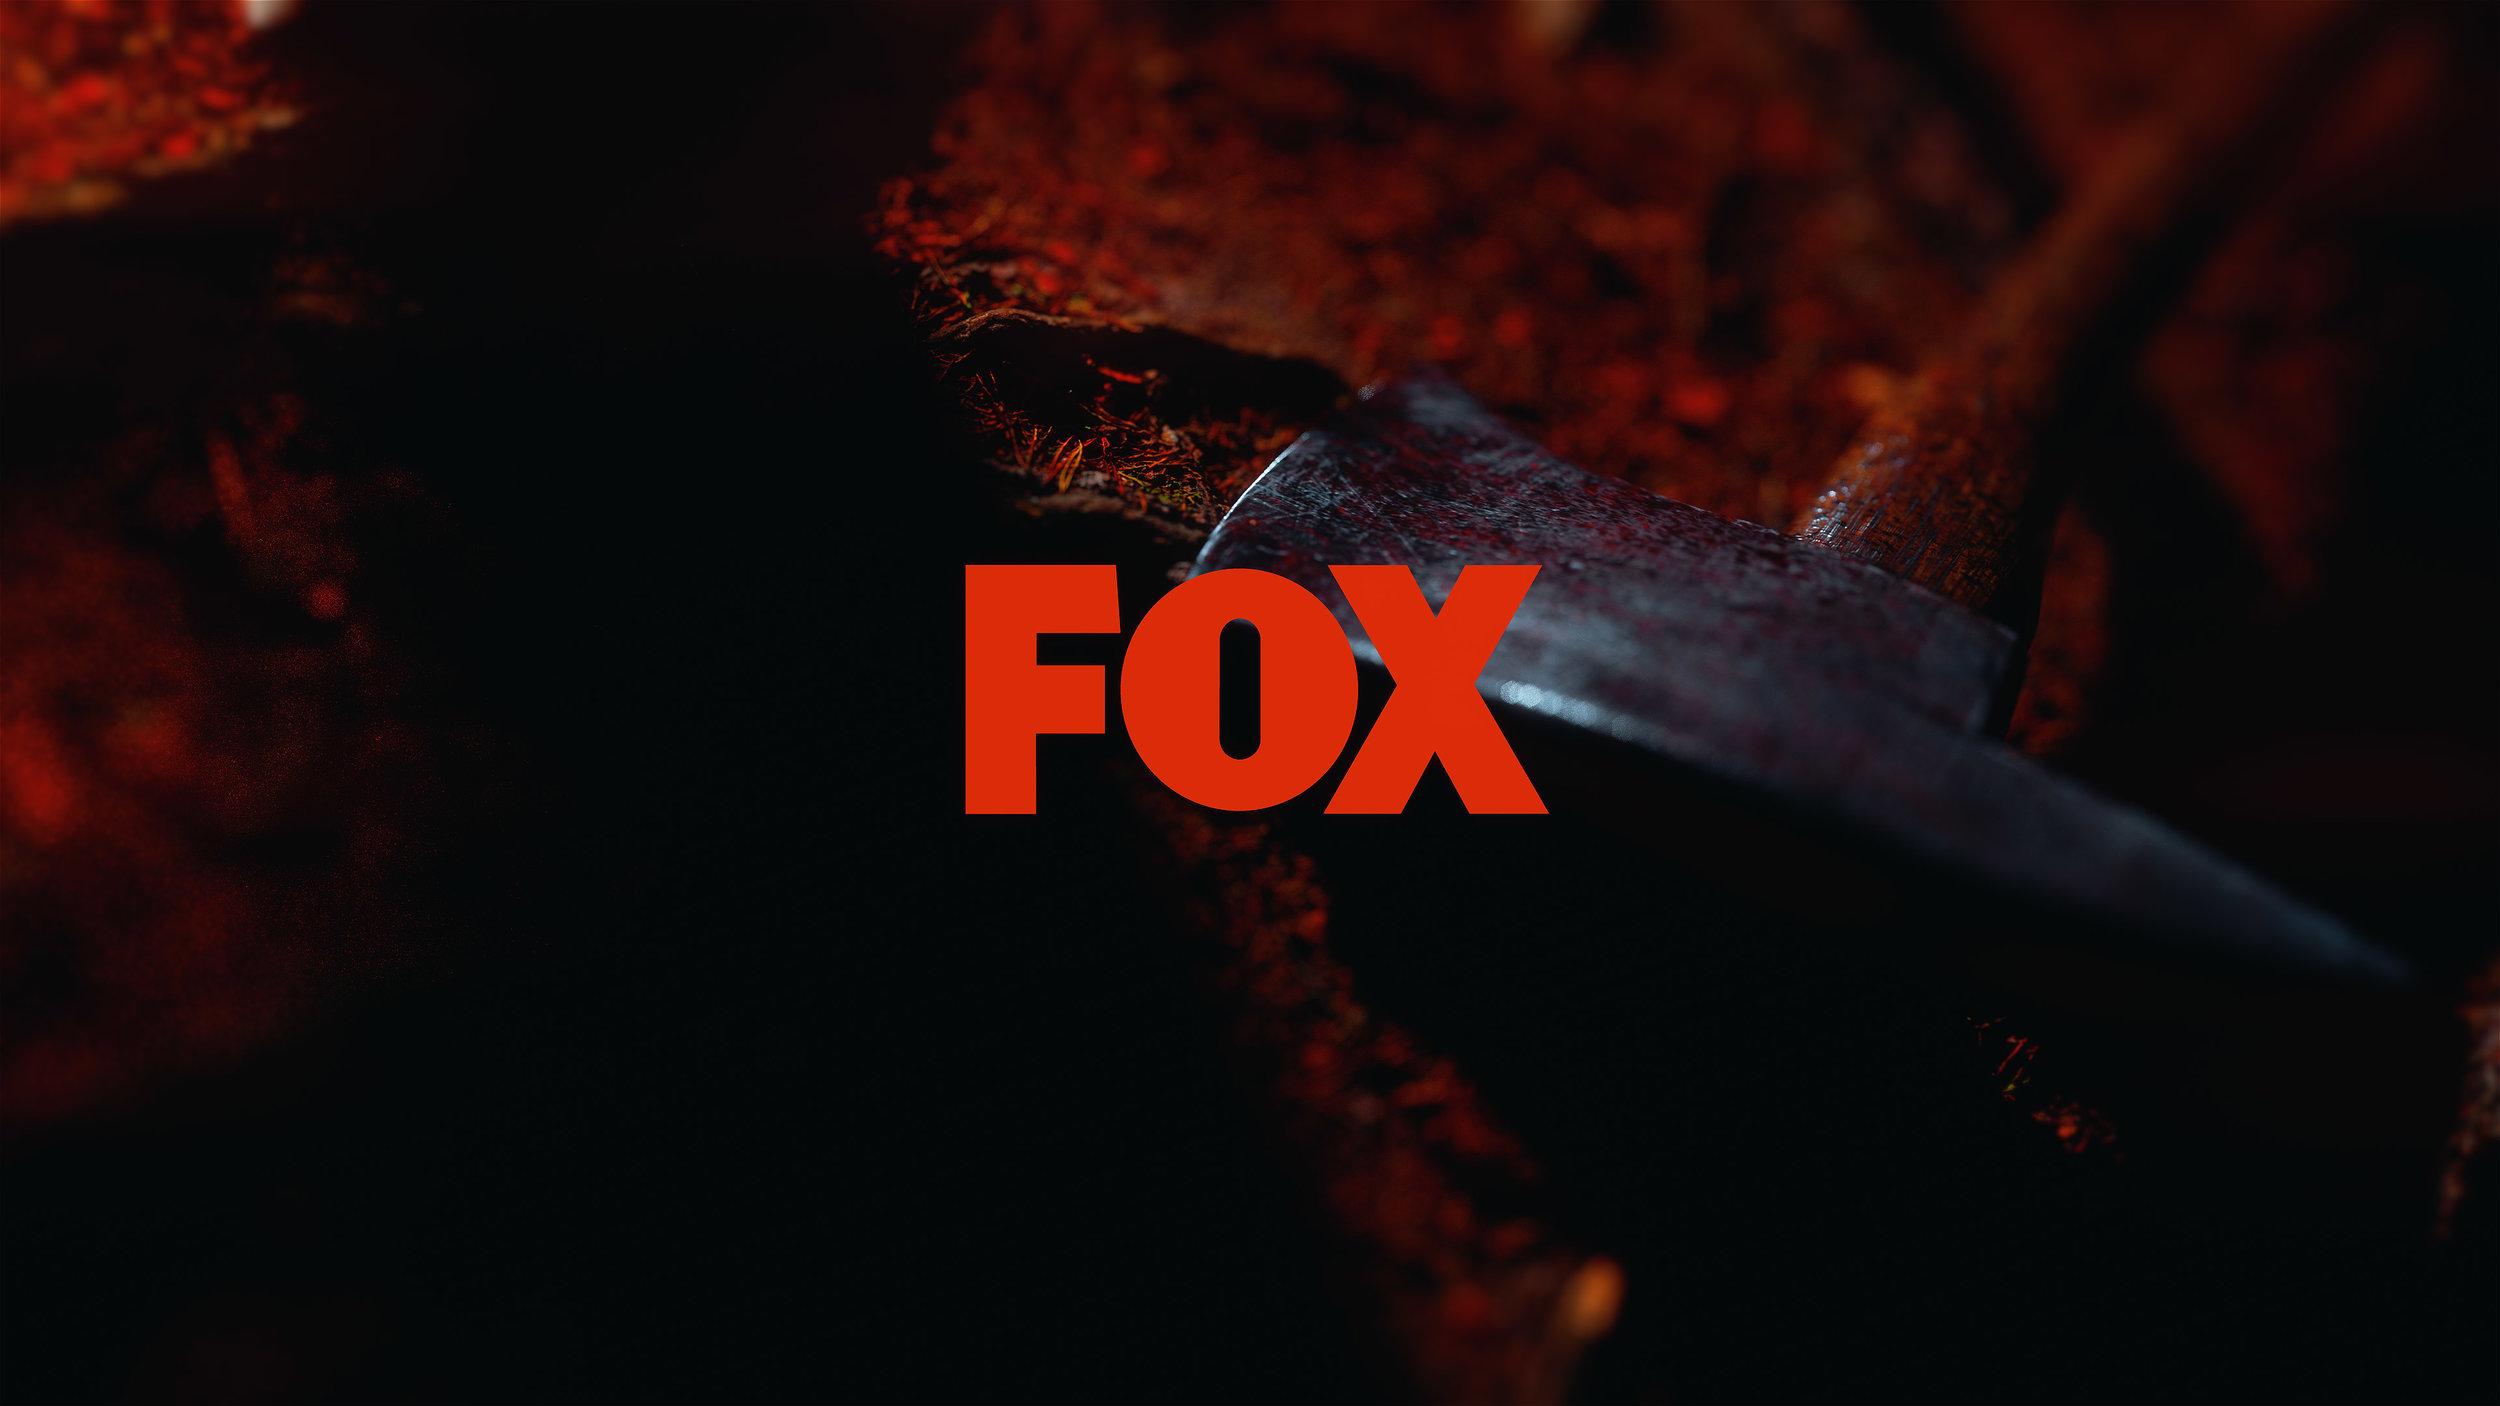 FOX_ProdigalSon_GraphicsPackage_LookB_190405_V06_MM.jpg